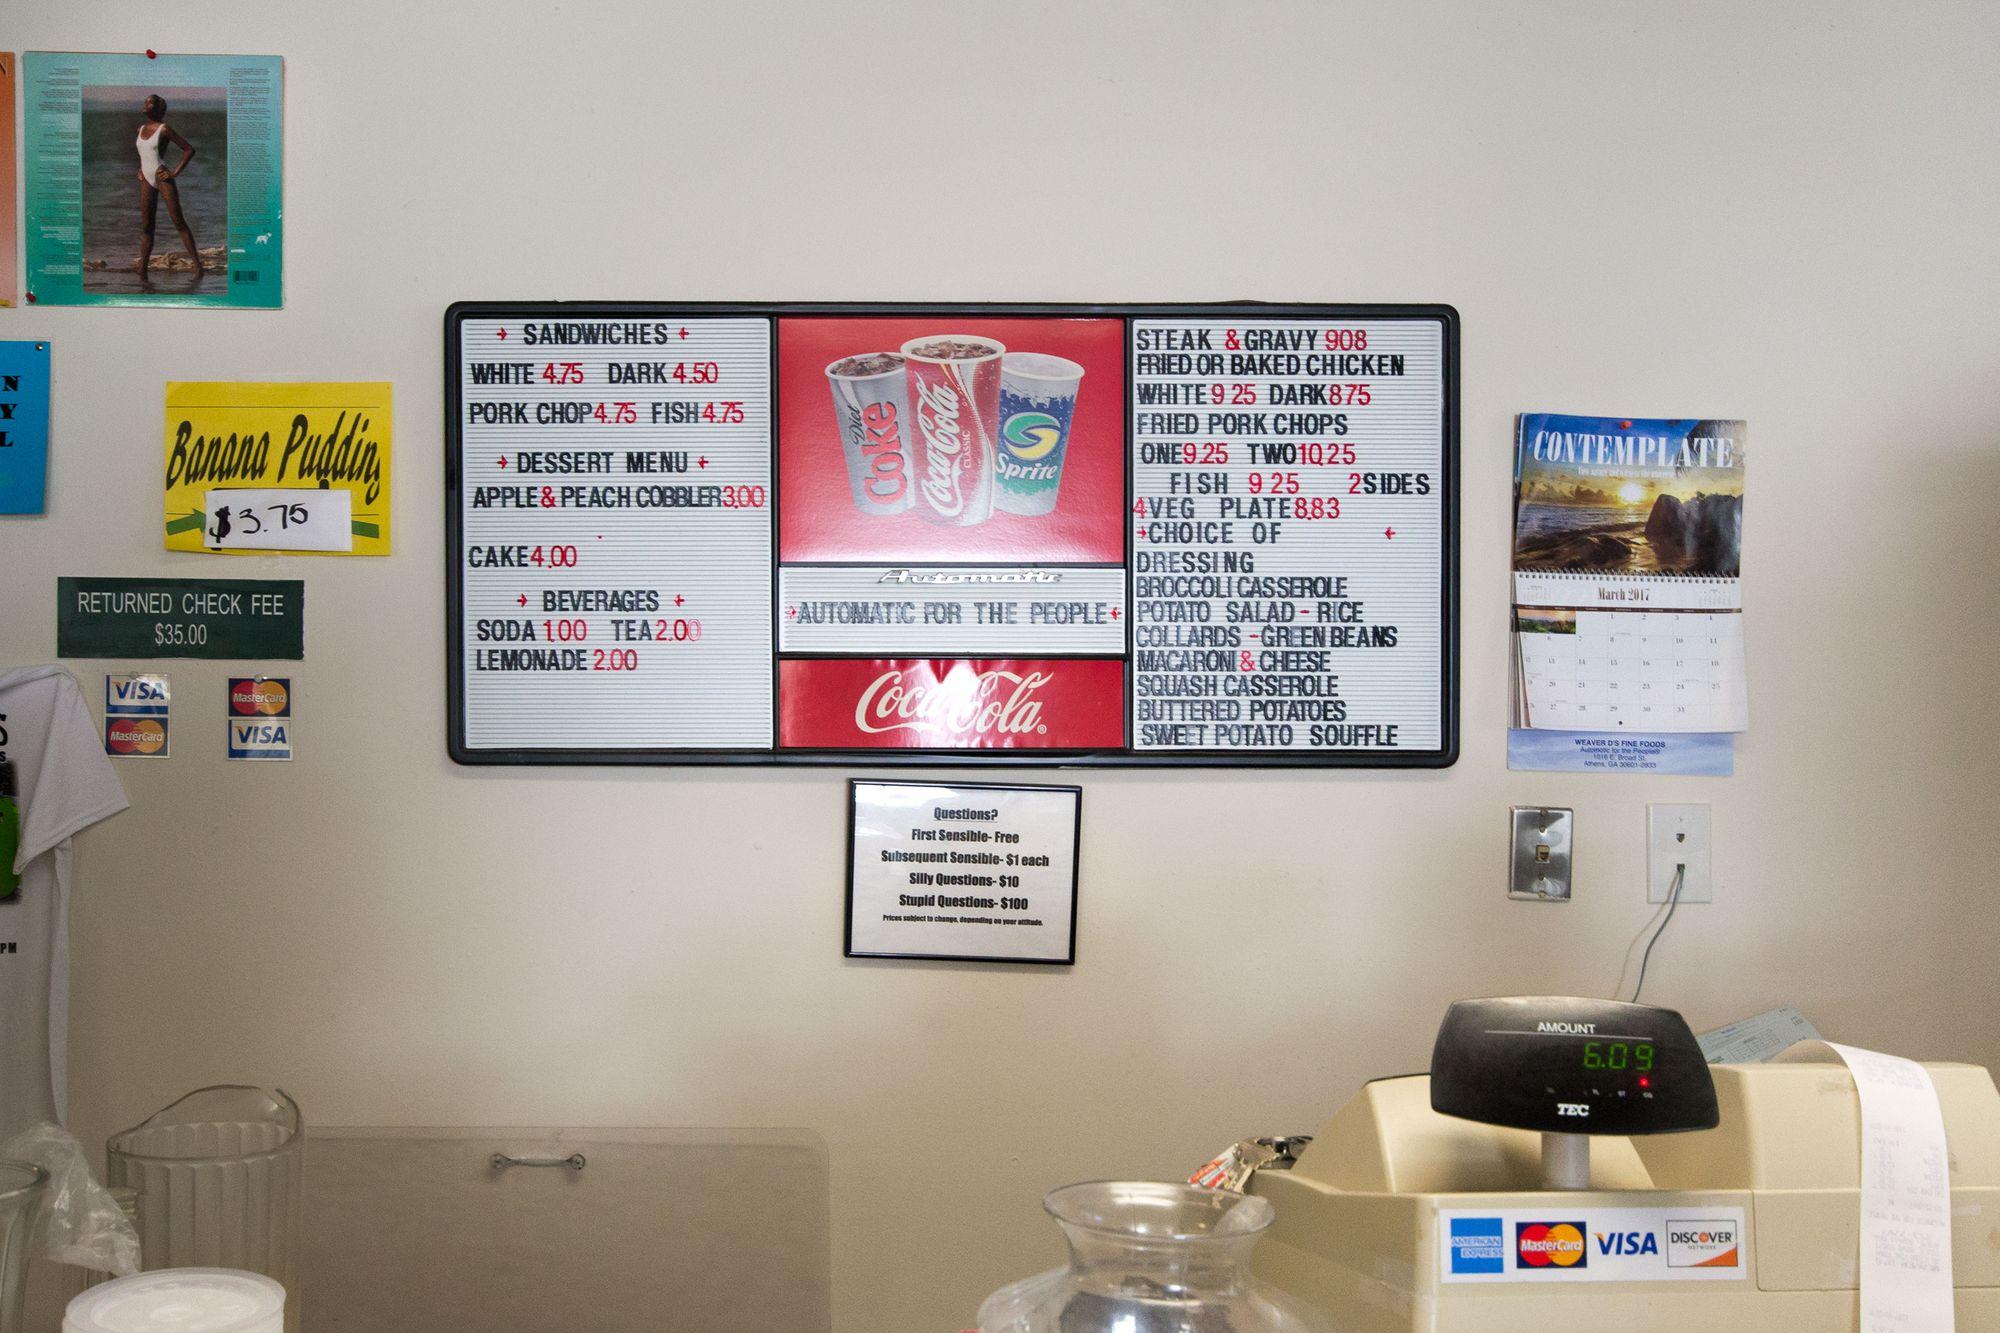 The Weaver D's menu.